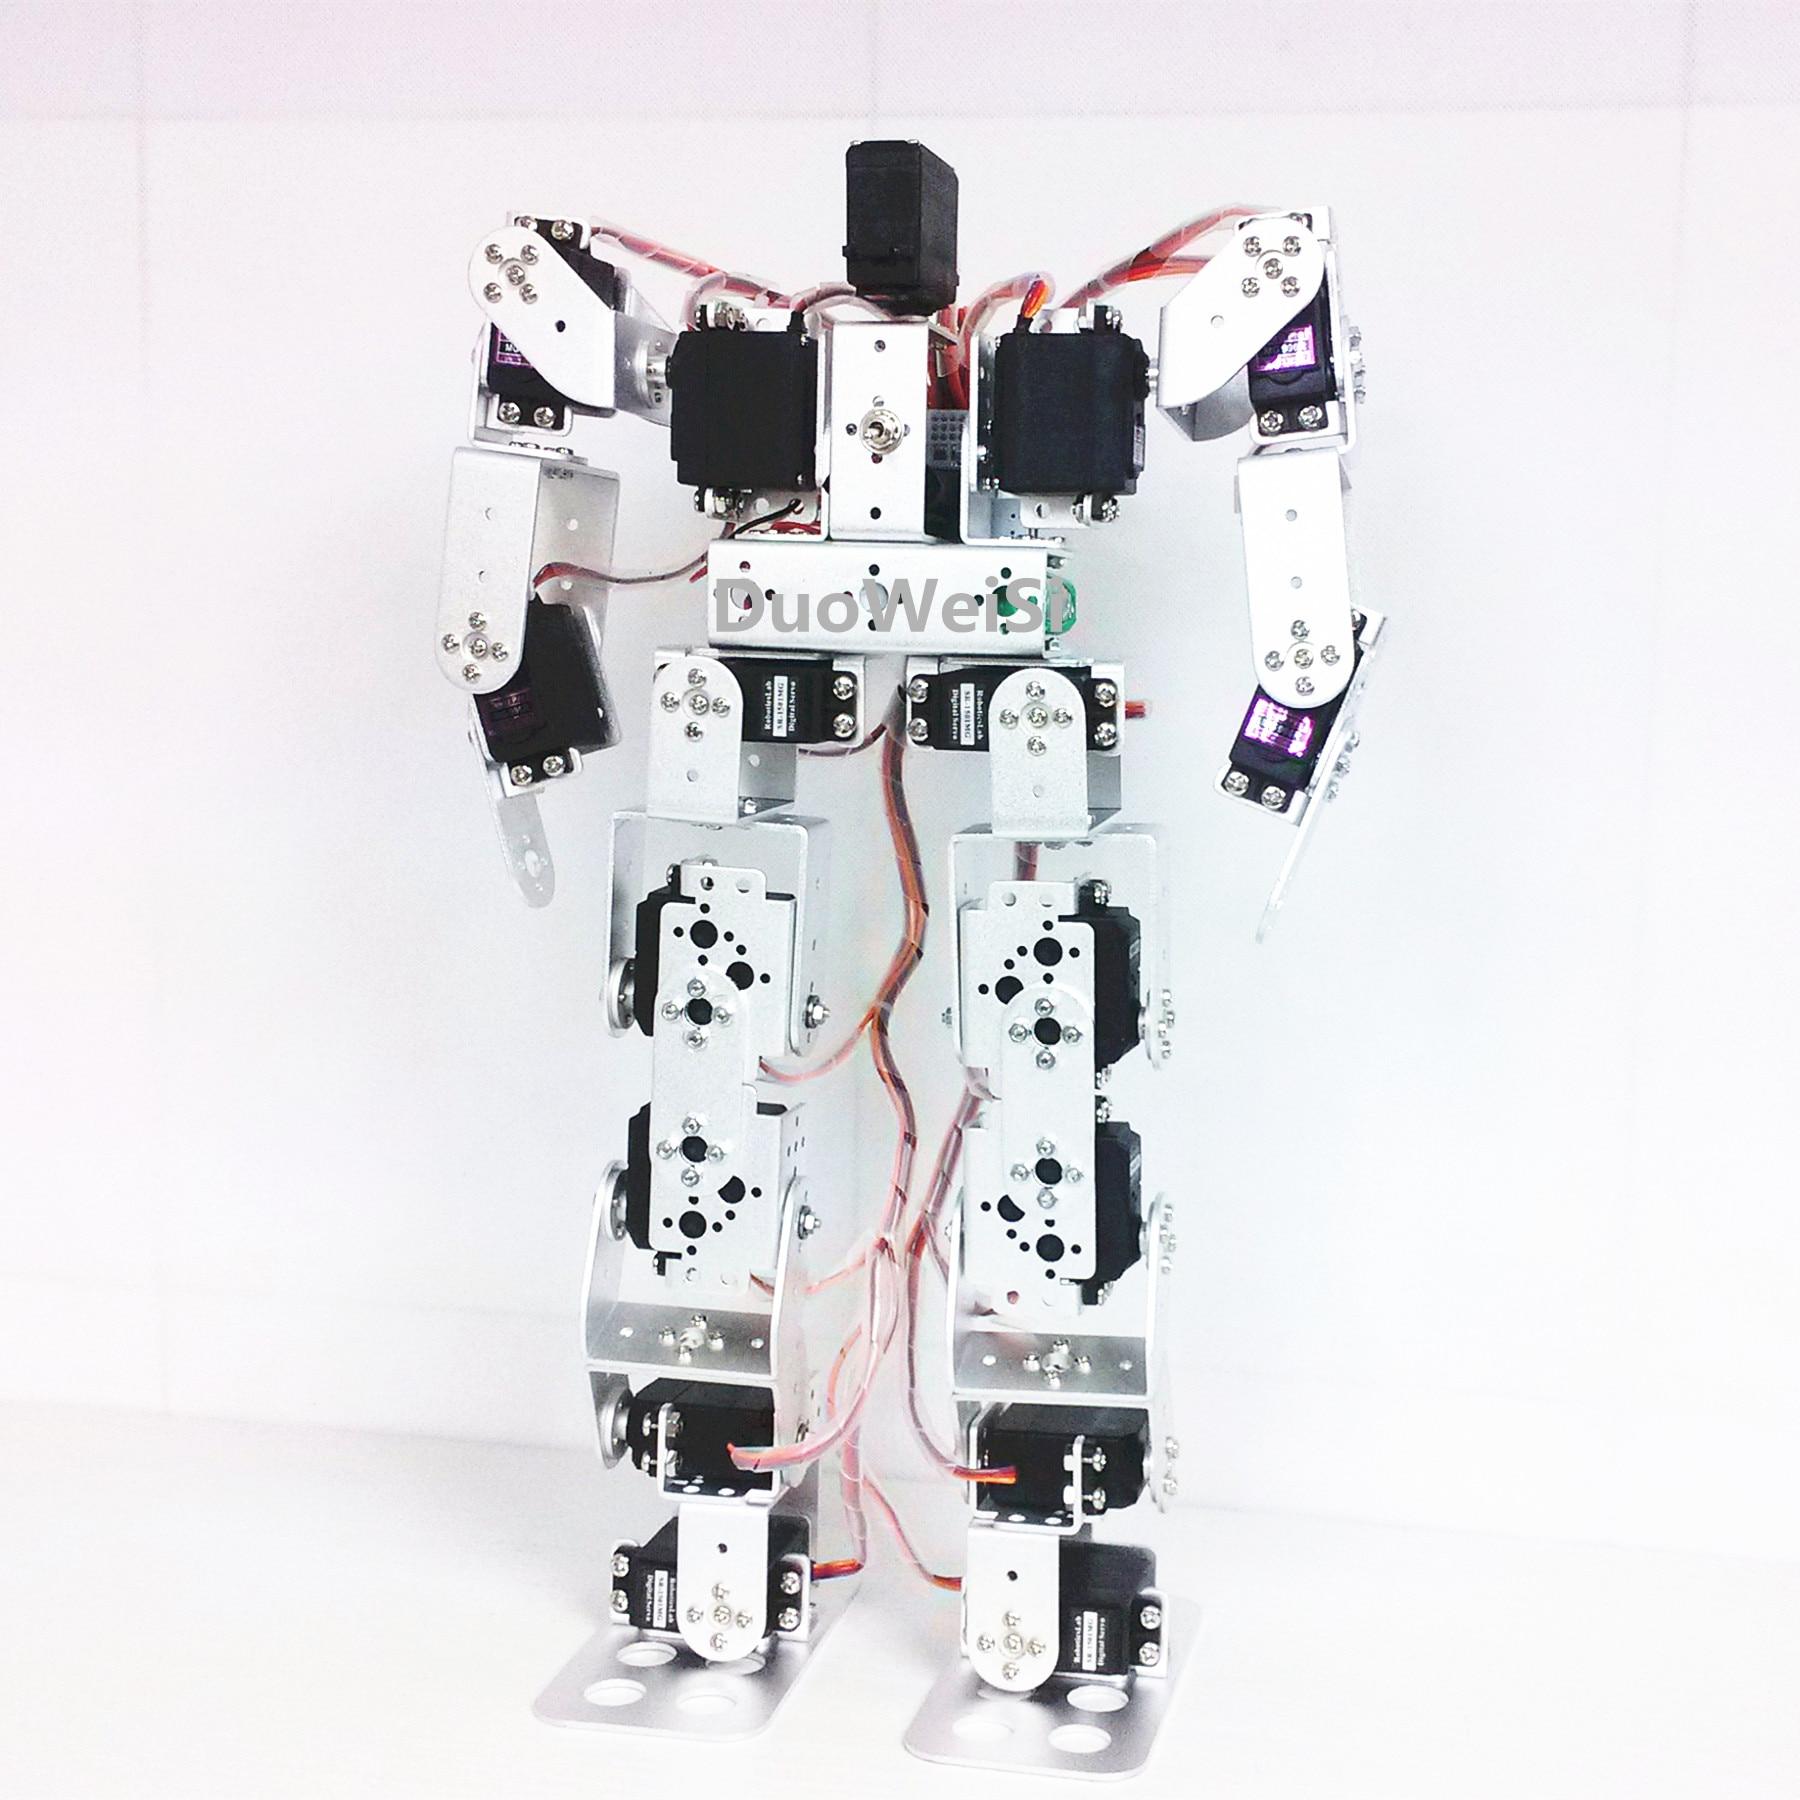 17 DOF Humanoid Dance Robot / Biped Walking Robot / Teaching Kit / Robot Competition 17 Degrees Of Freedom Robot